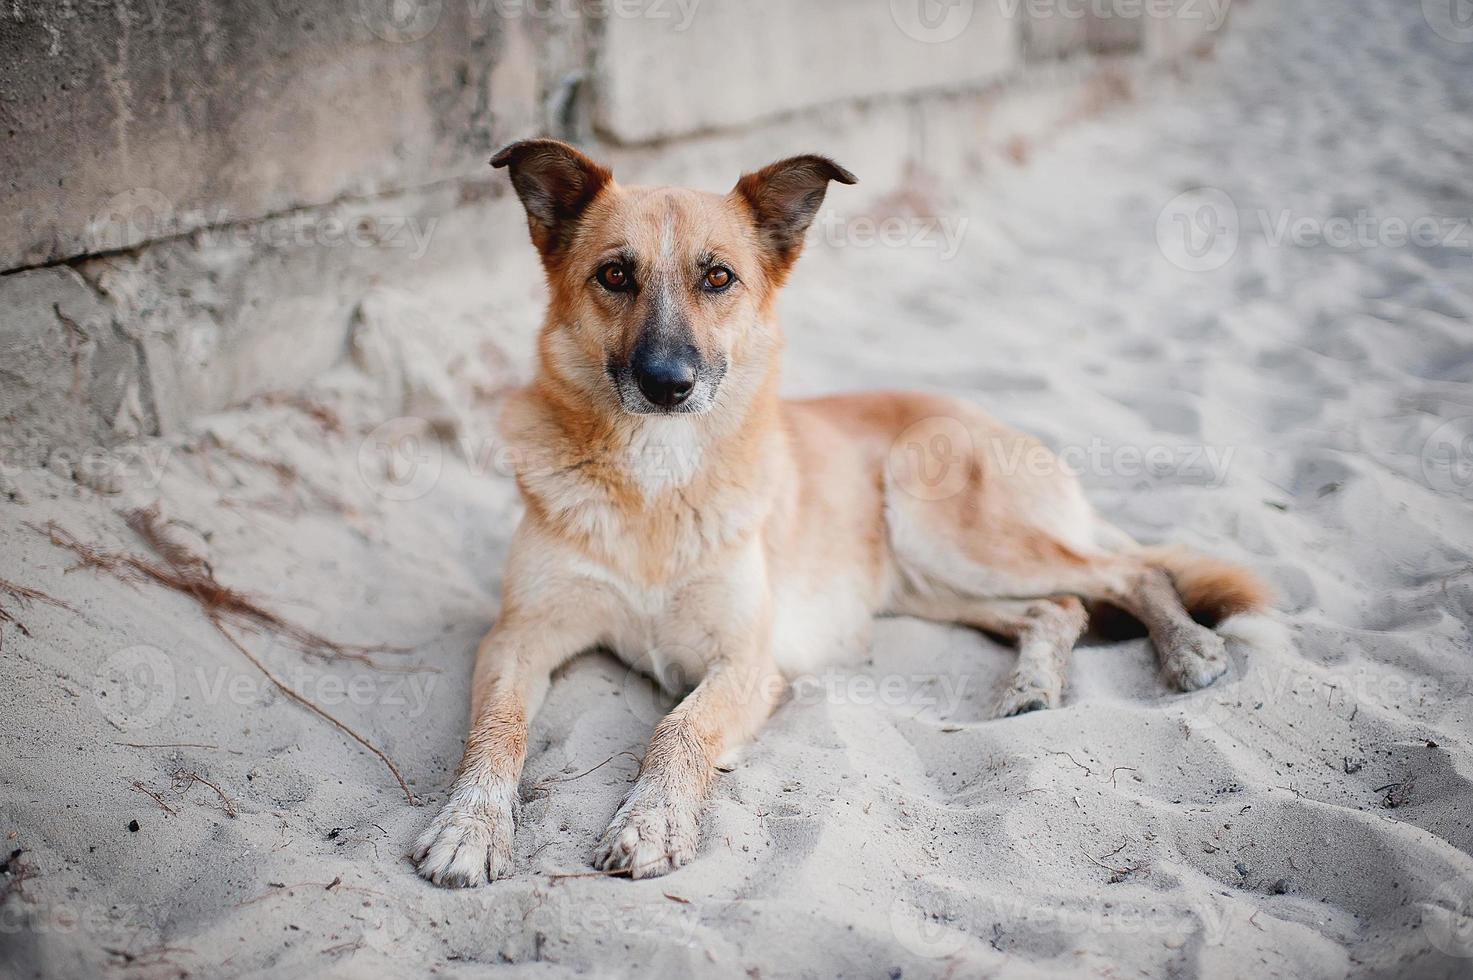 cachorro deitado na areia foto